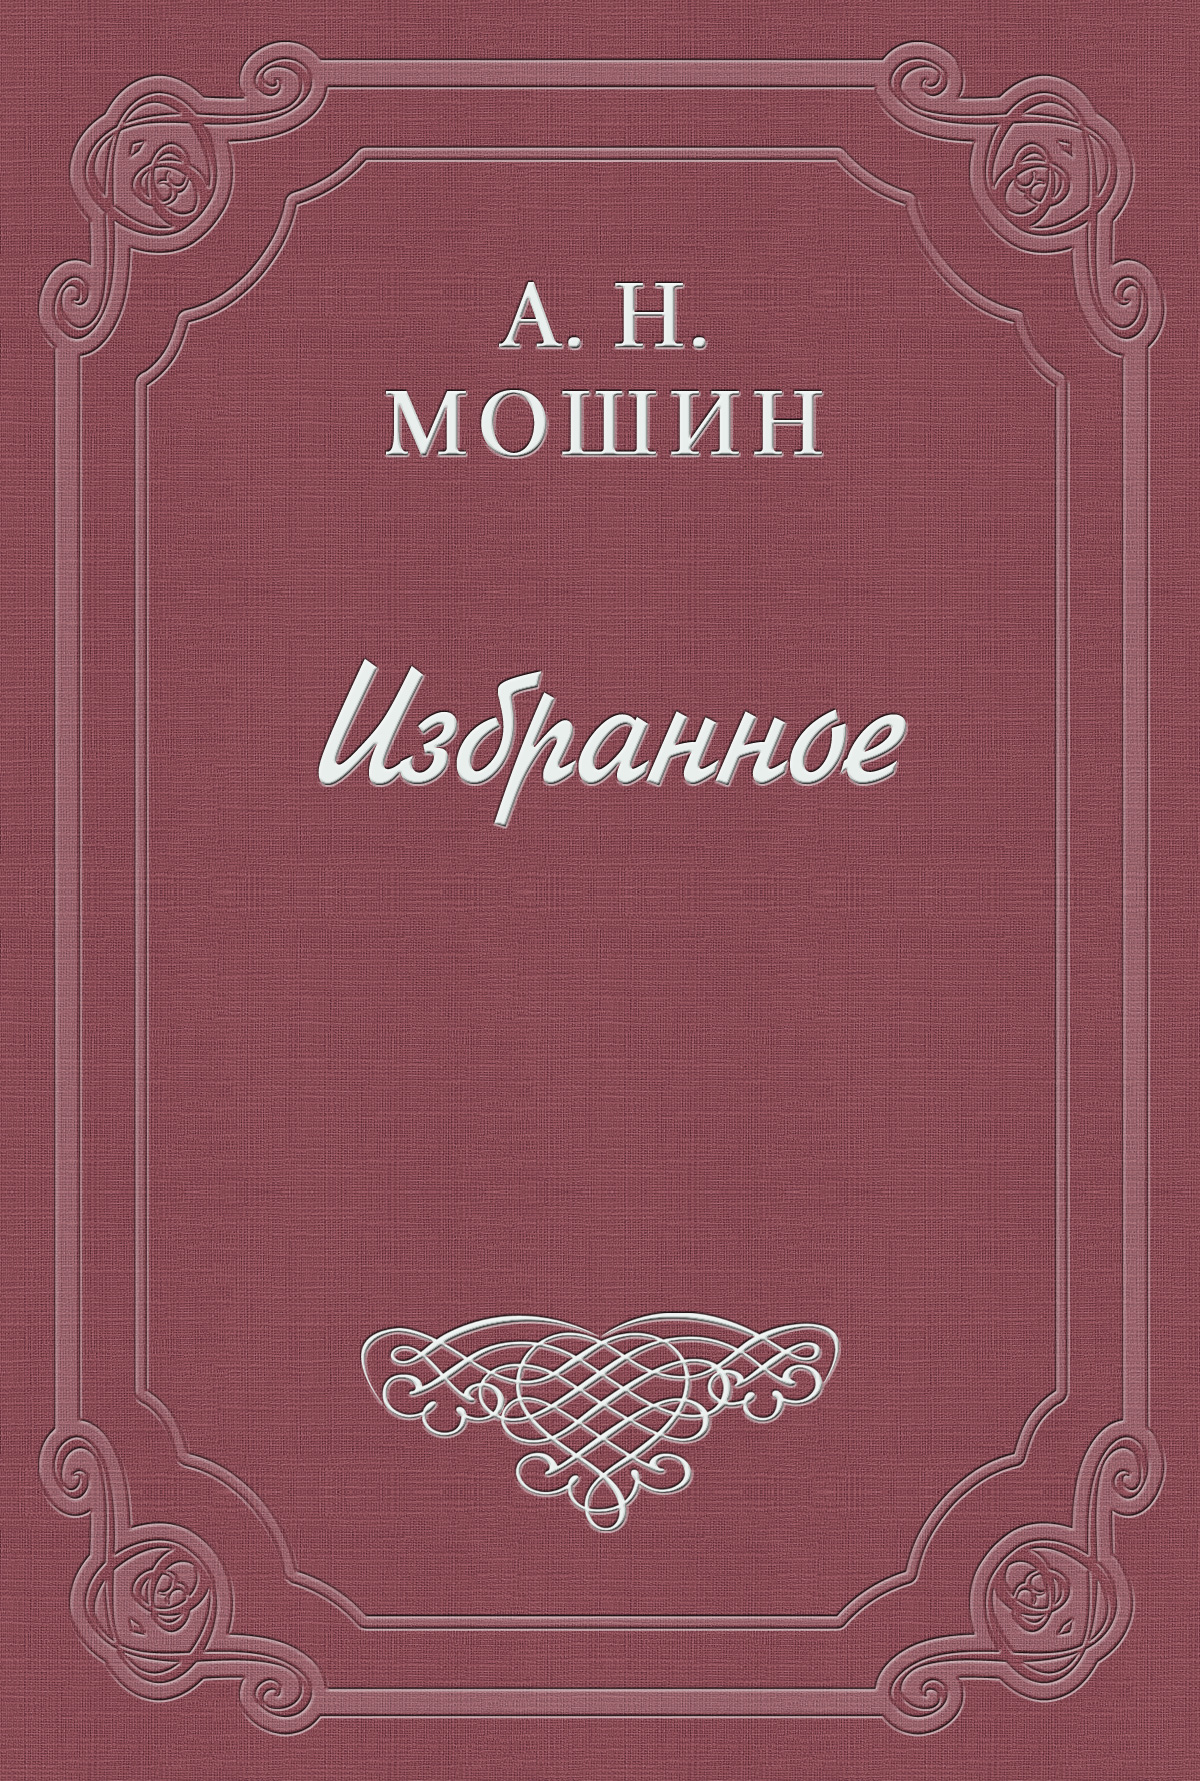 Алексей Мошин Под открытым небом